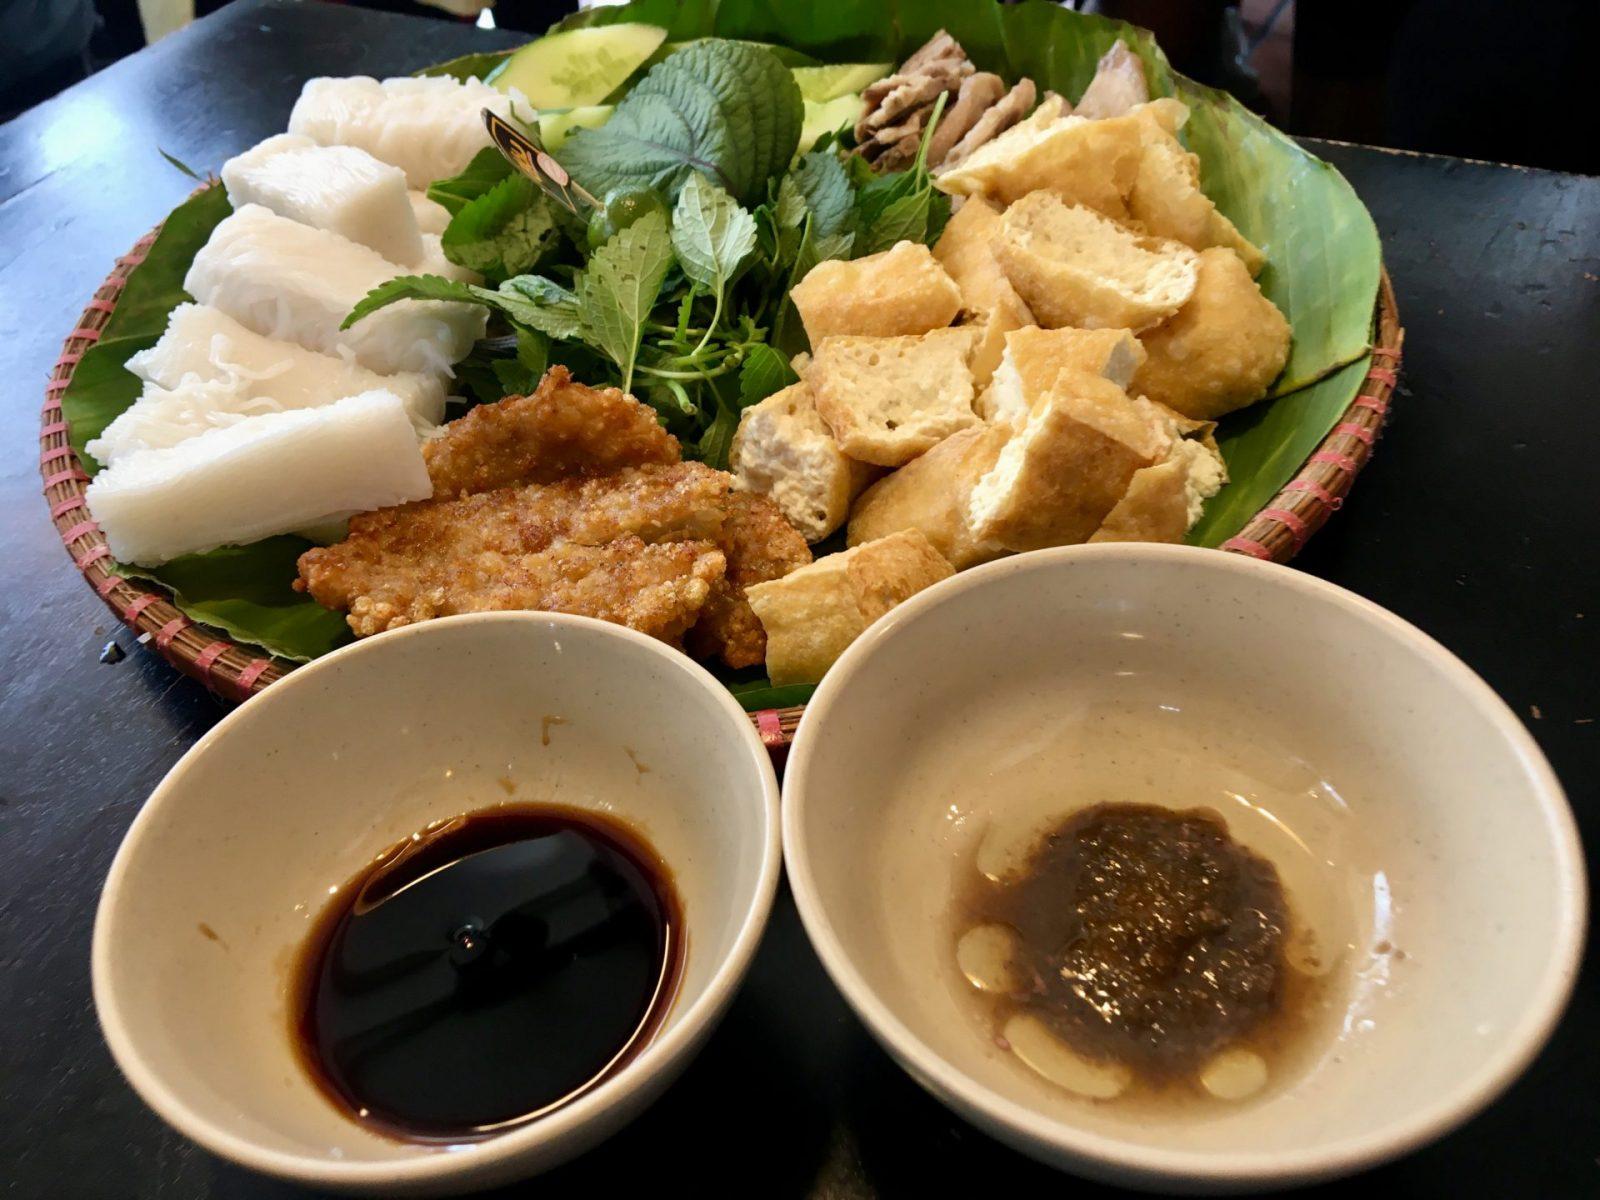 Bún Đậu Mắm Tôm - Soy Sauce Shrimp Sauce with Bun Dau